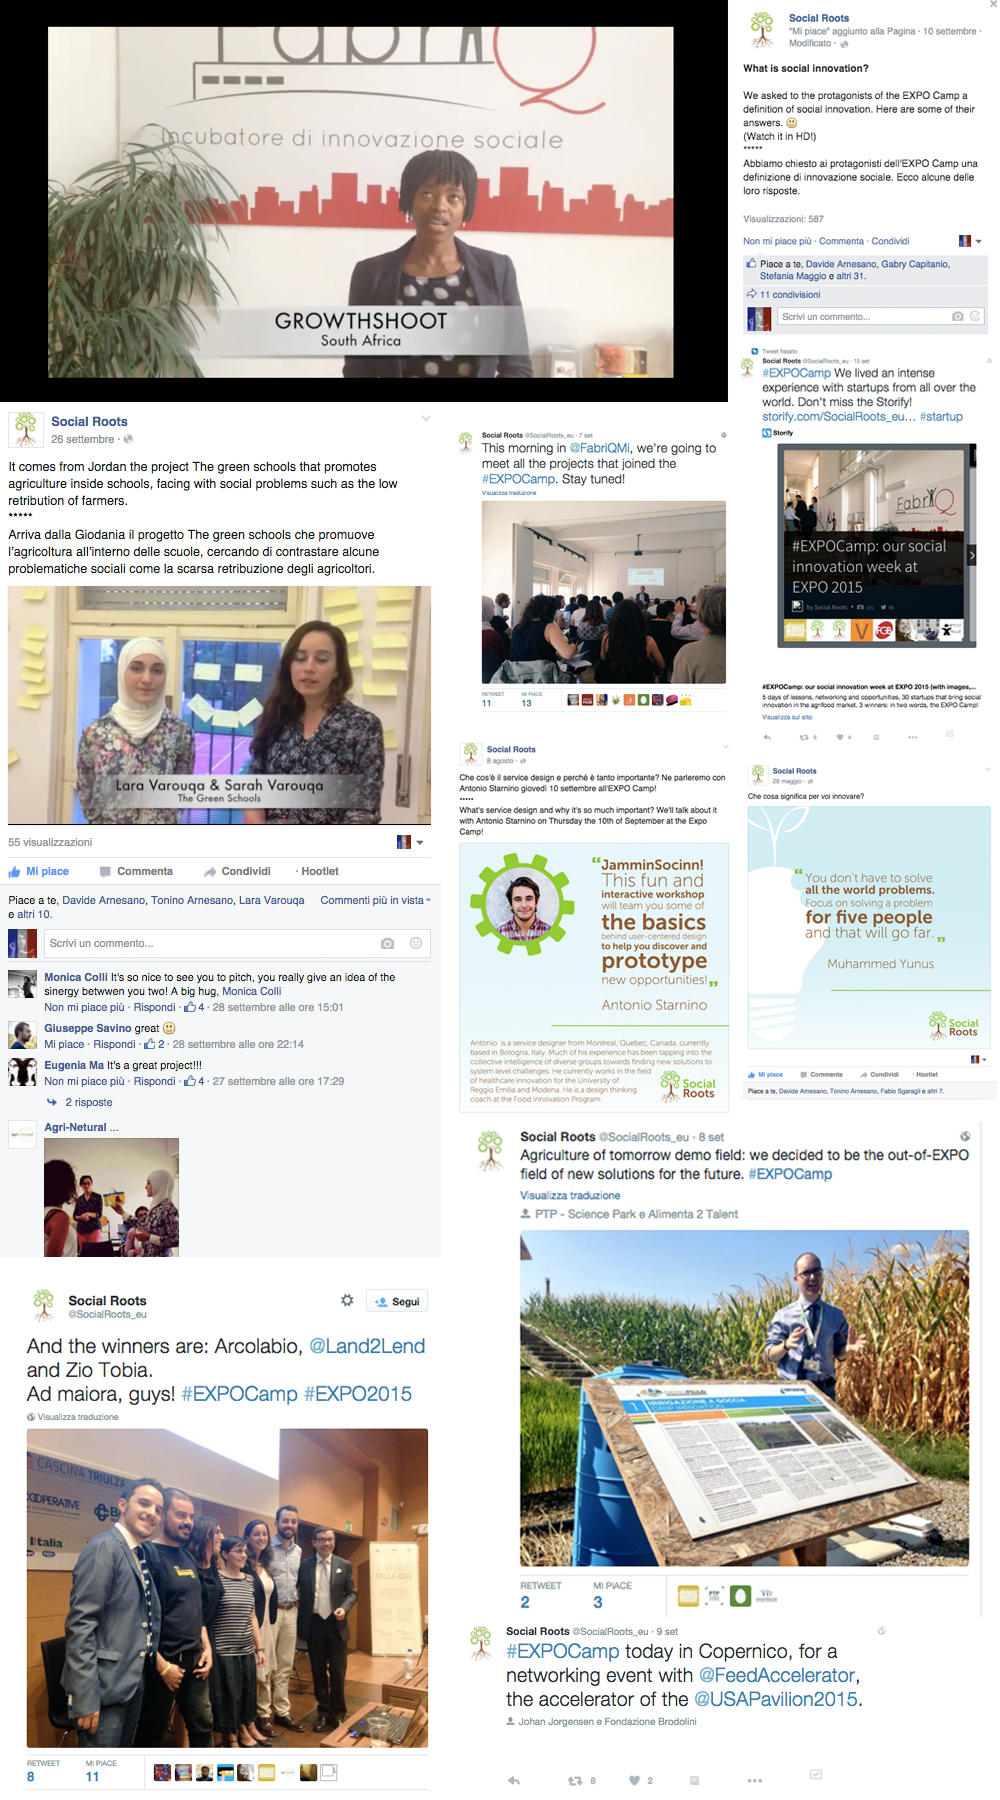 Social Roots: esempi di post sui Facebook e Twitter